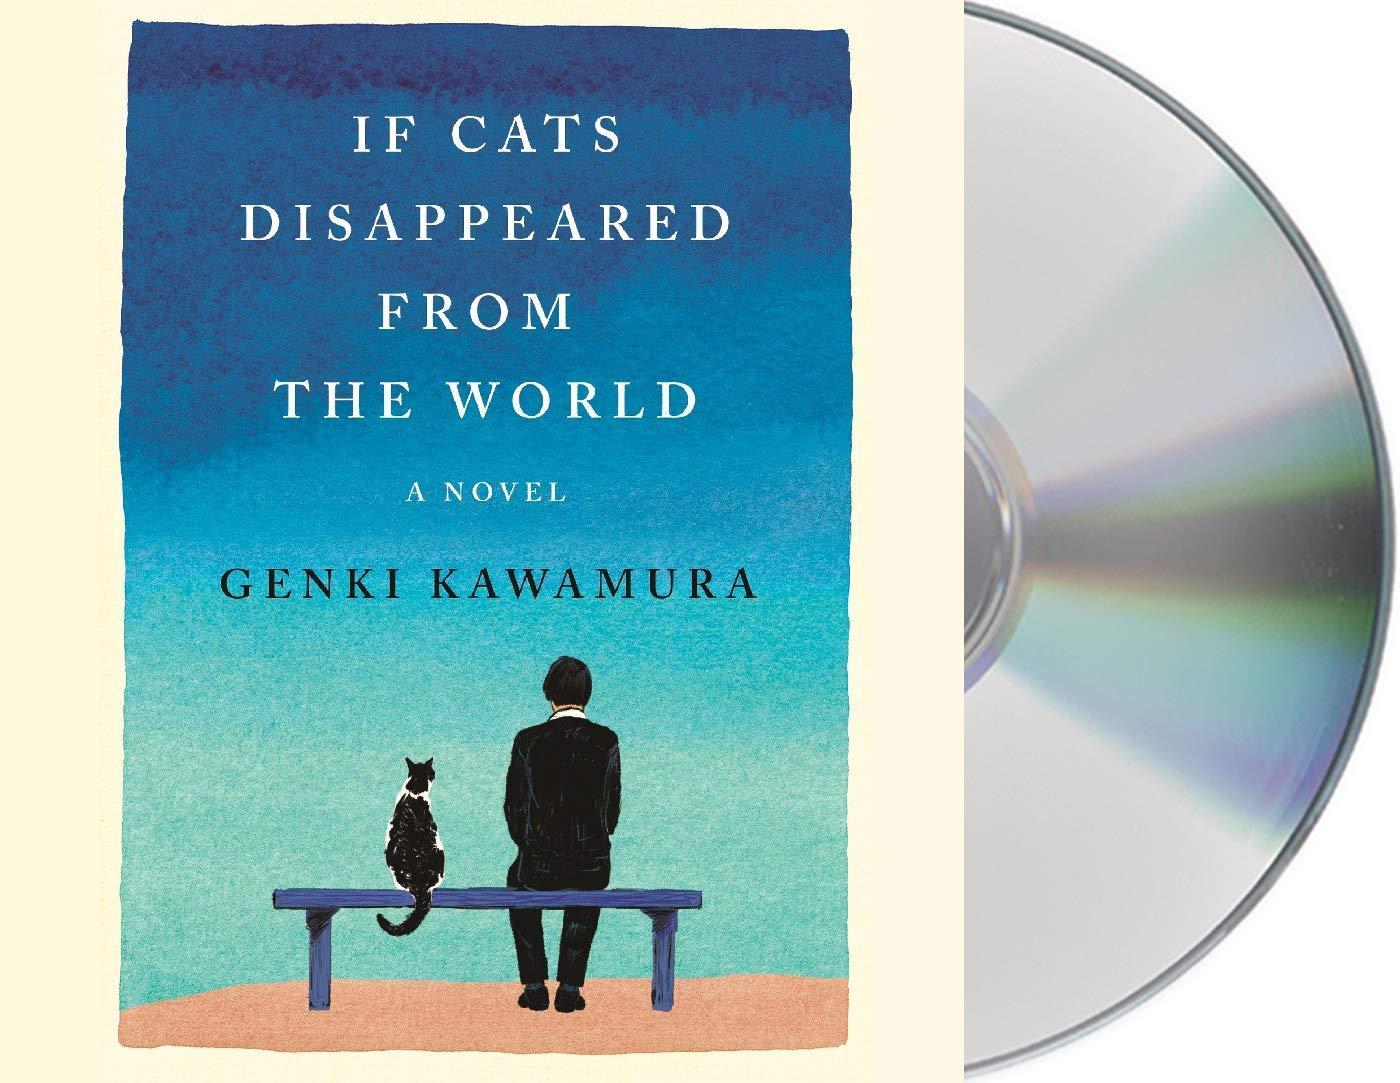 If Cats Disappeared from the World: Amazon.es: Genki Kawamura, Brian Nishii, Eric Selland: Libros en idiomas extranjeros